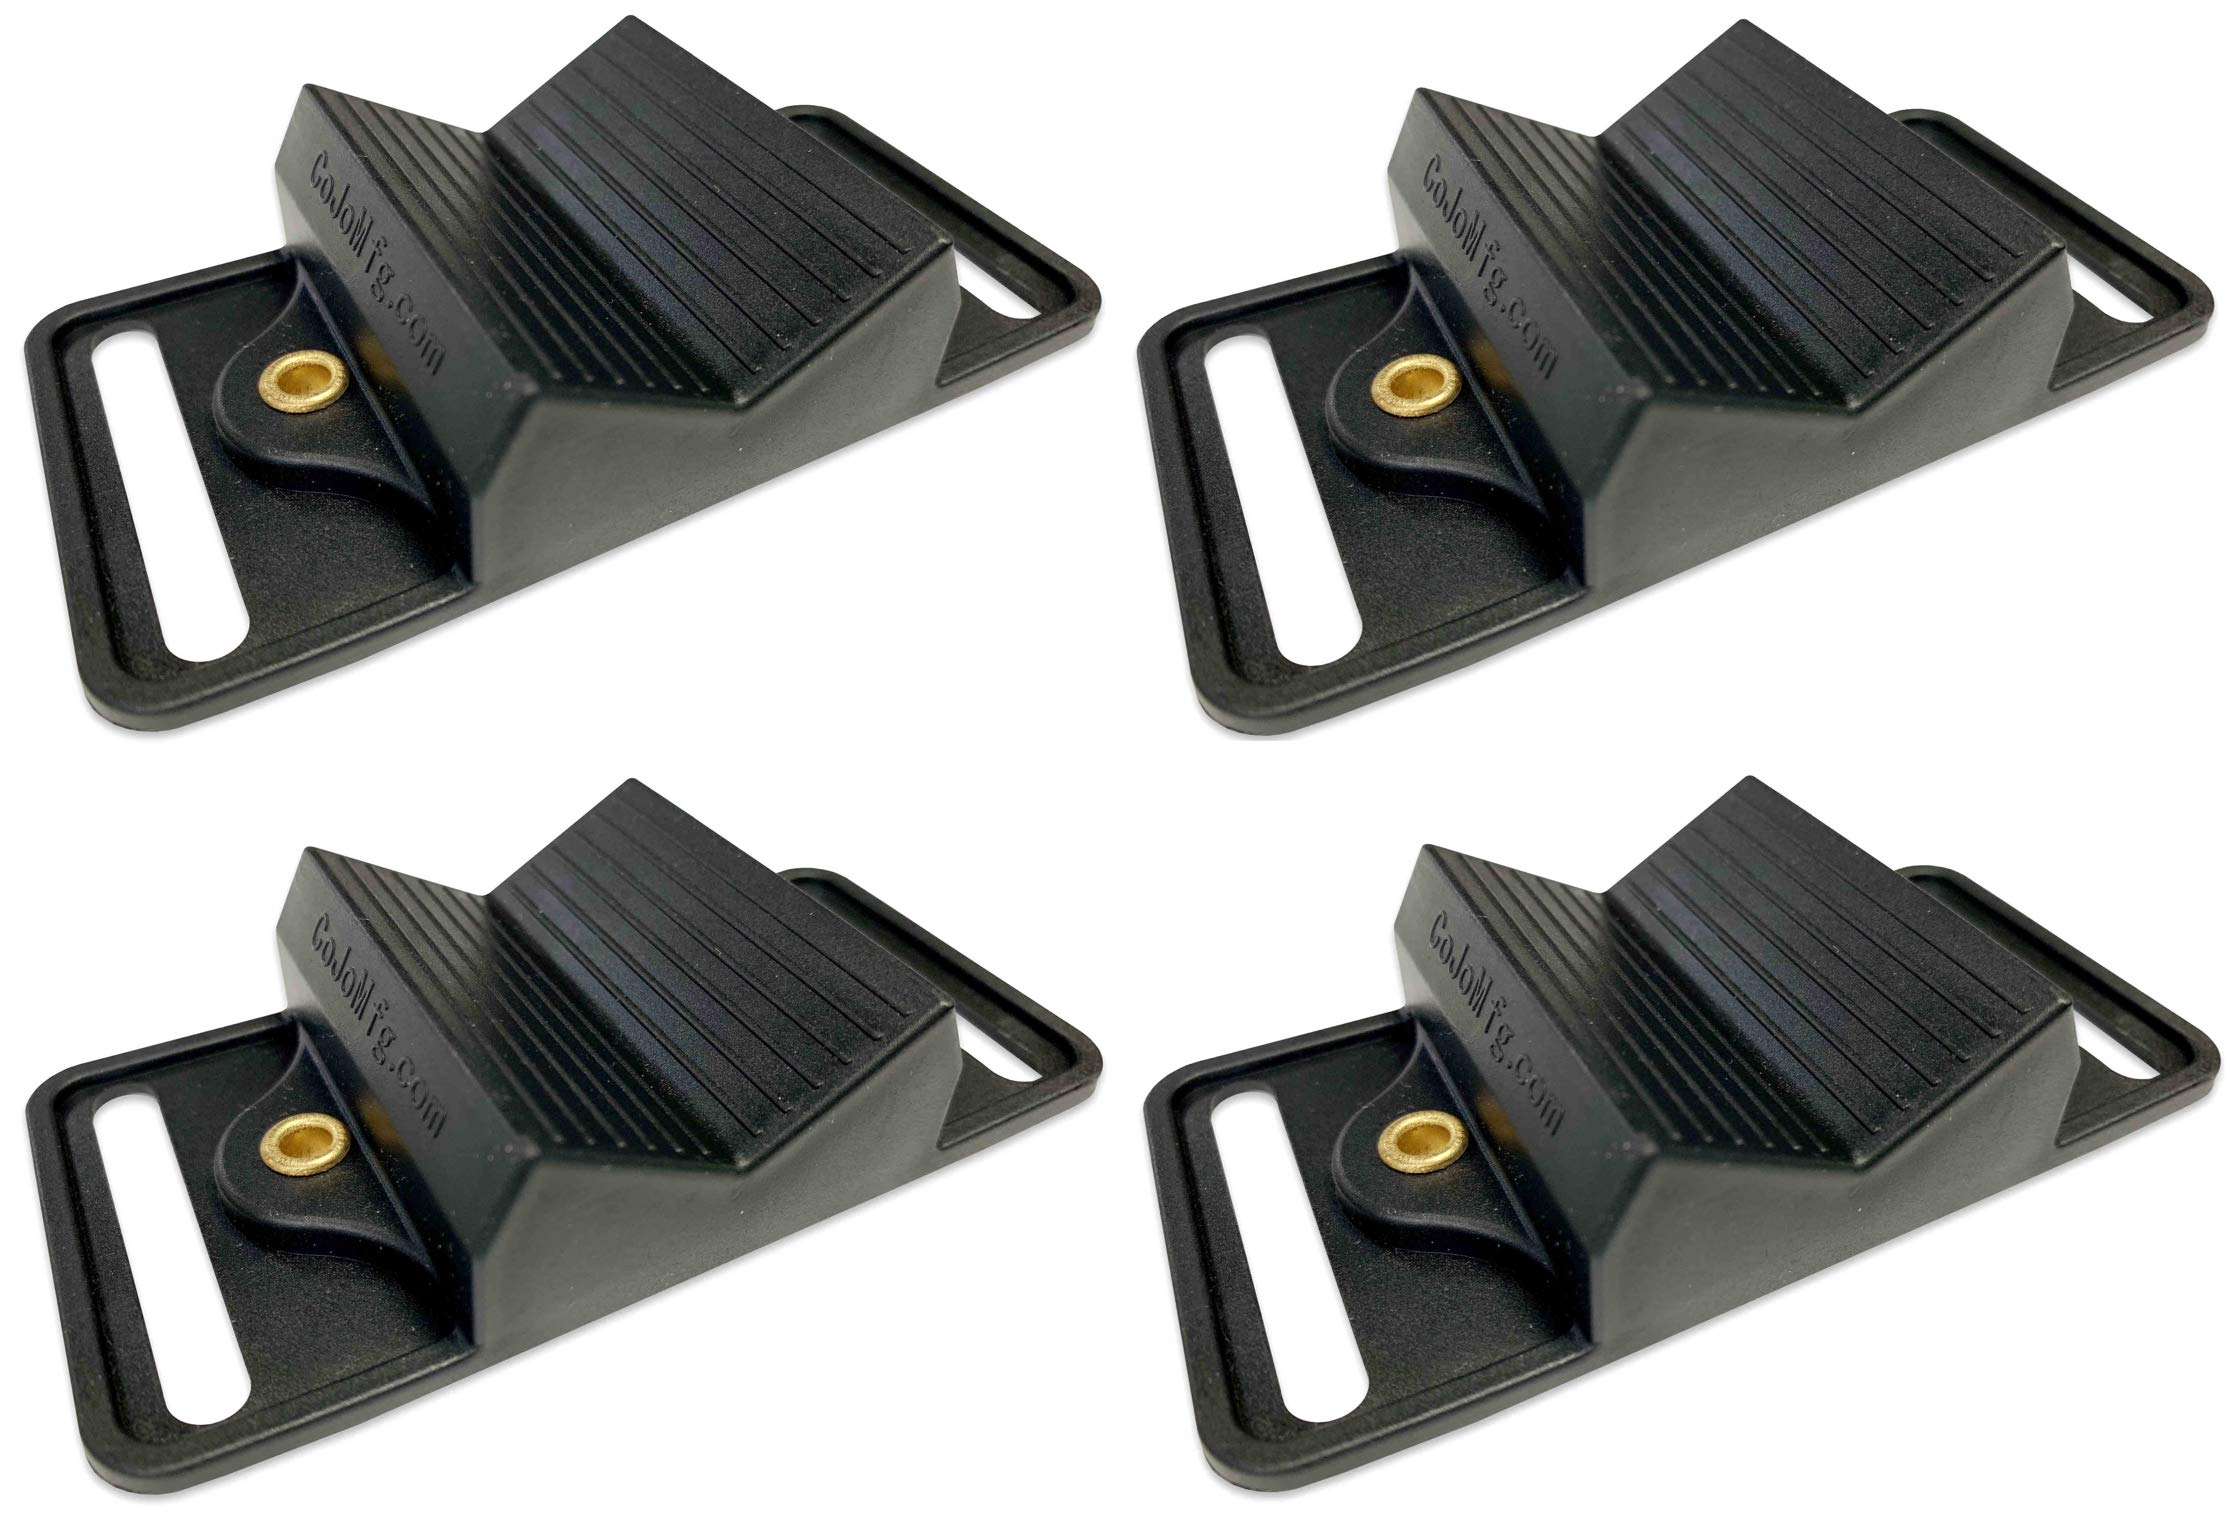 COJO MFG. 4-Pack of Gun Magnet Mount Anywhere, Non Scratch, Gun Holder for Car, ATV, Side by Side, Bed Side- Shotguns in Duck Blinds, Deer Blinds, Deer Stands by COJO MFG.